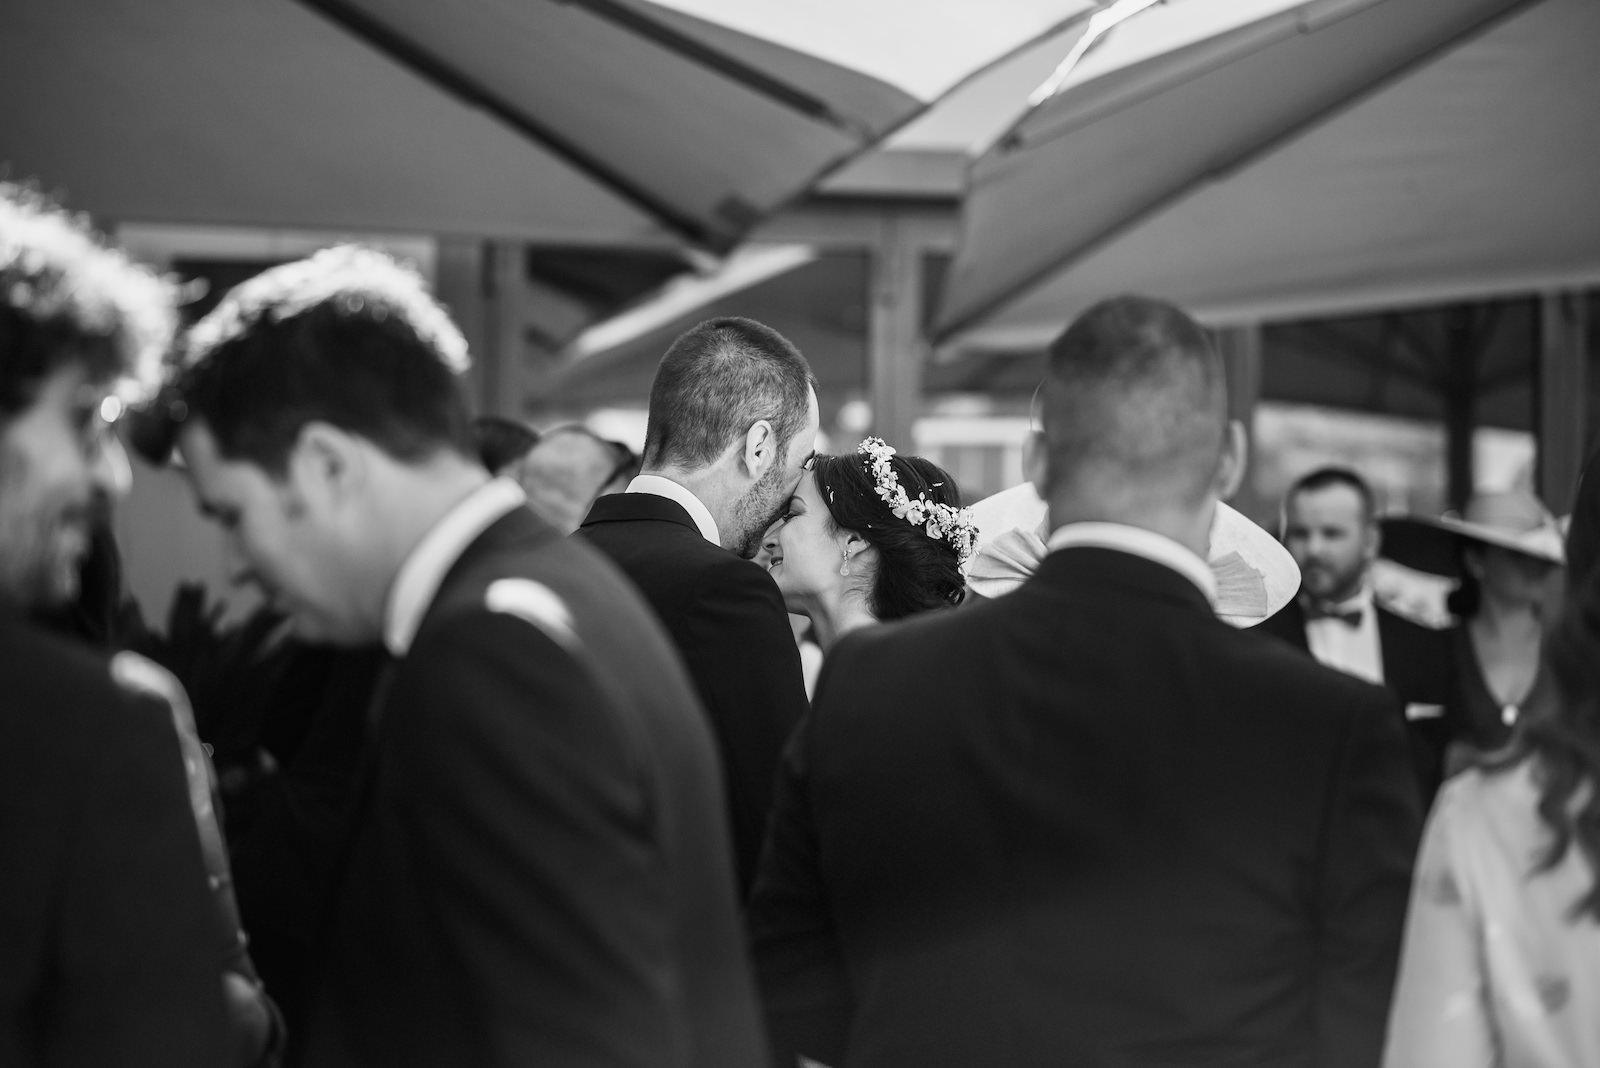 fotografia de boda novios al fondo rodeados de invitados